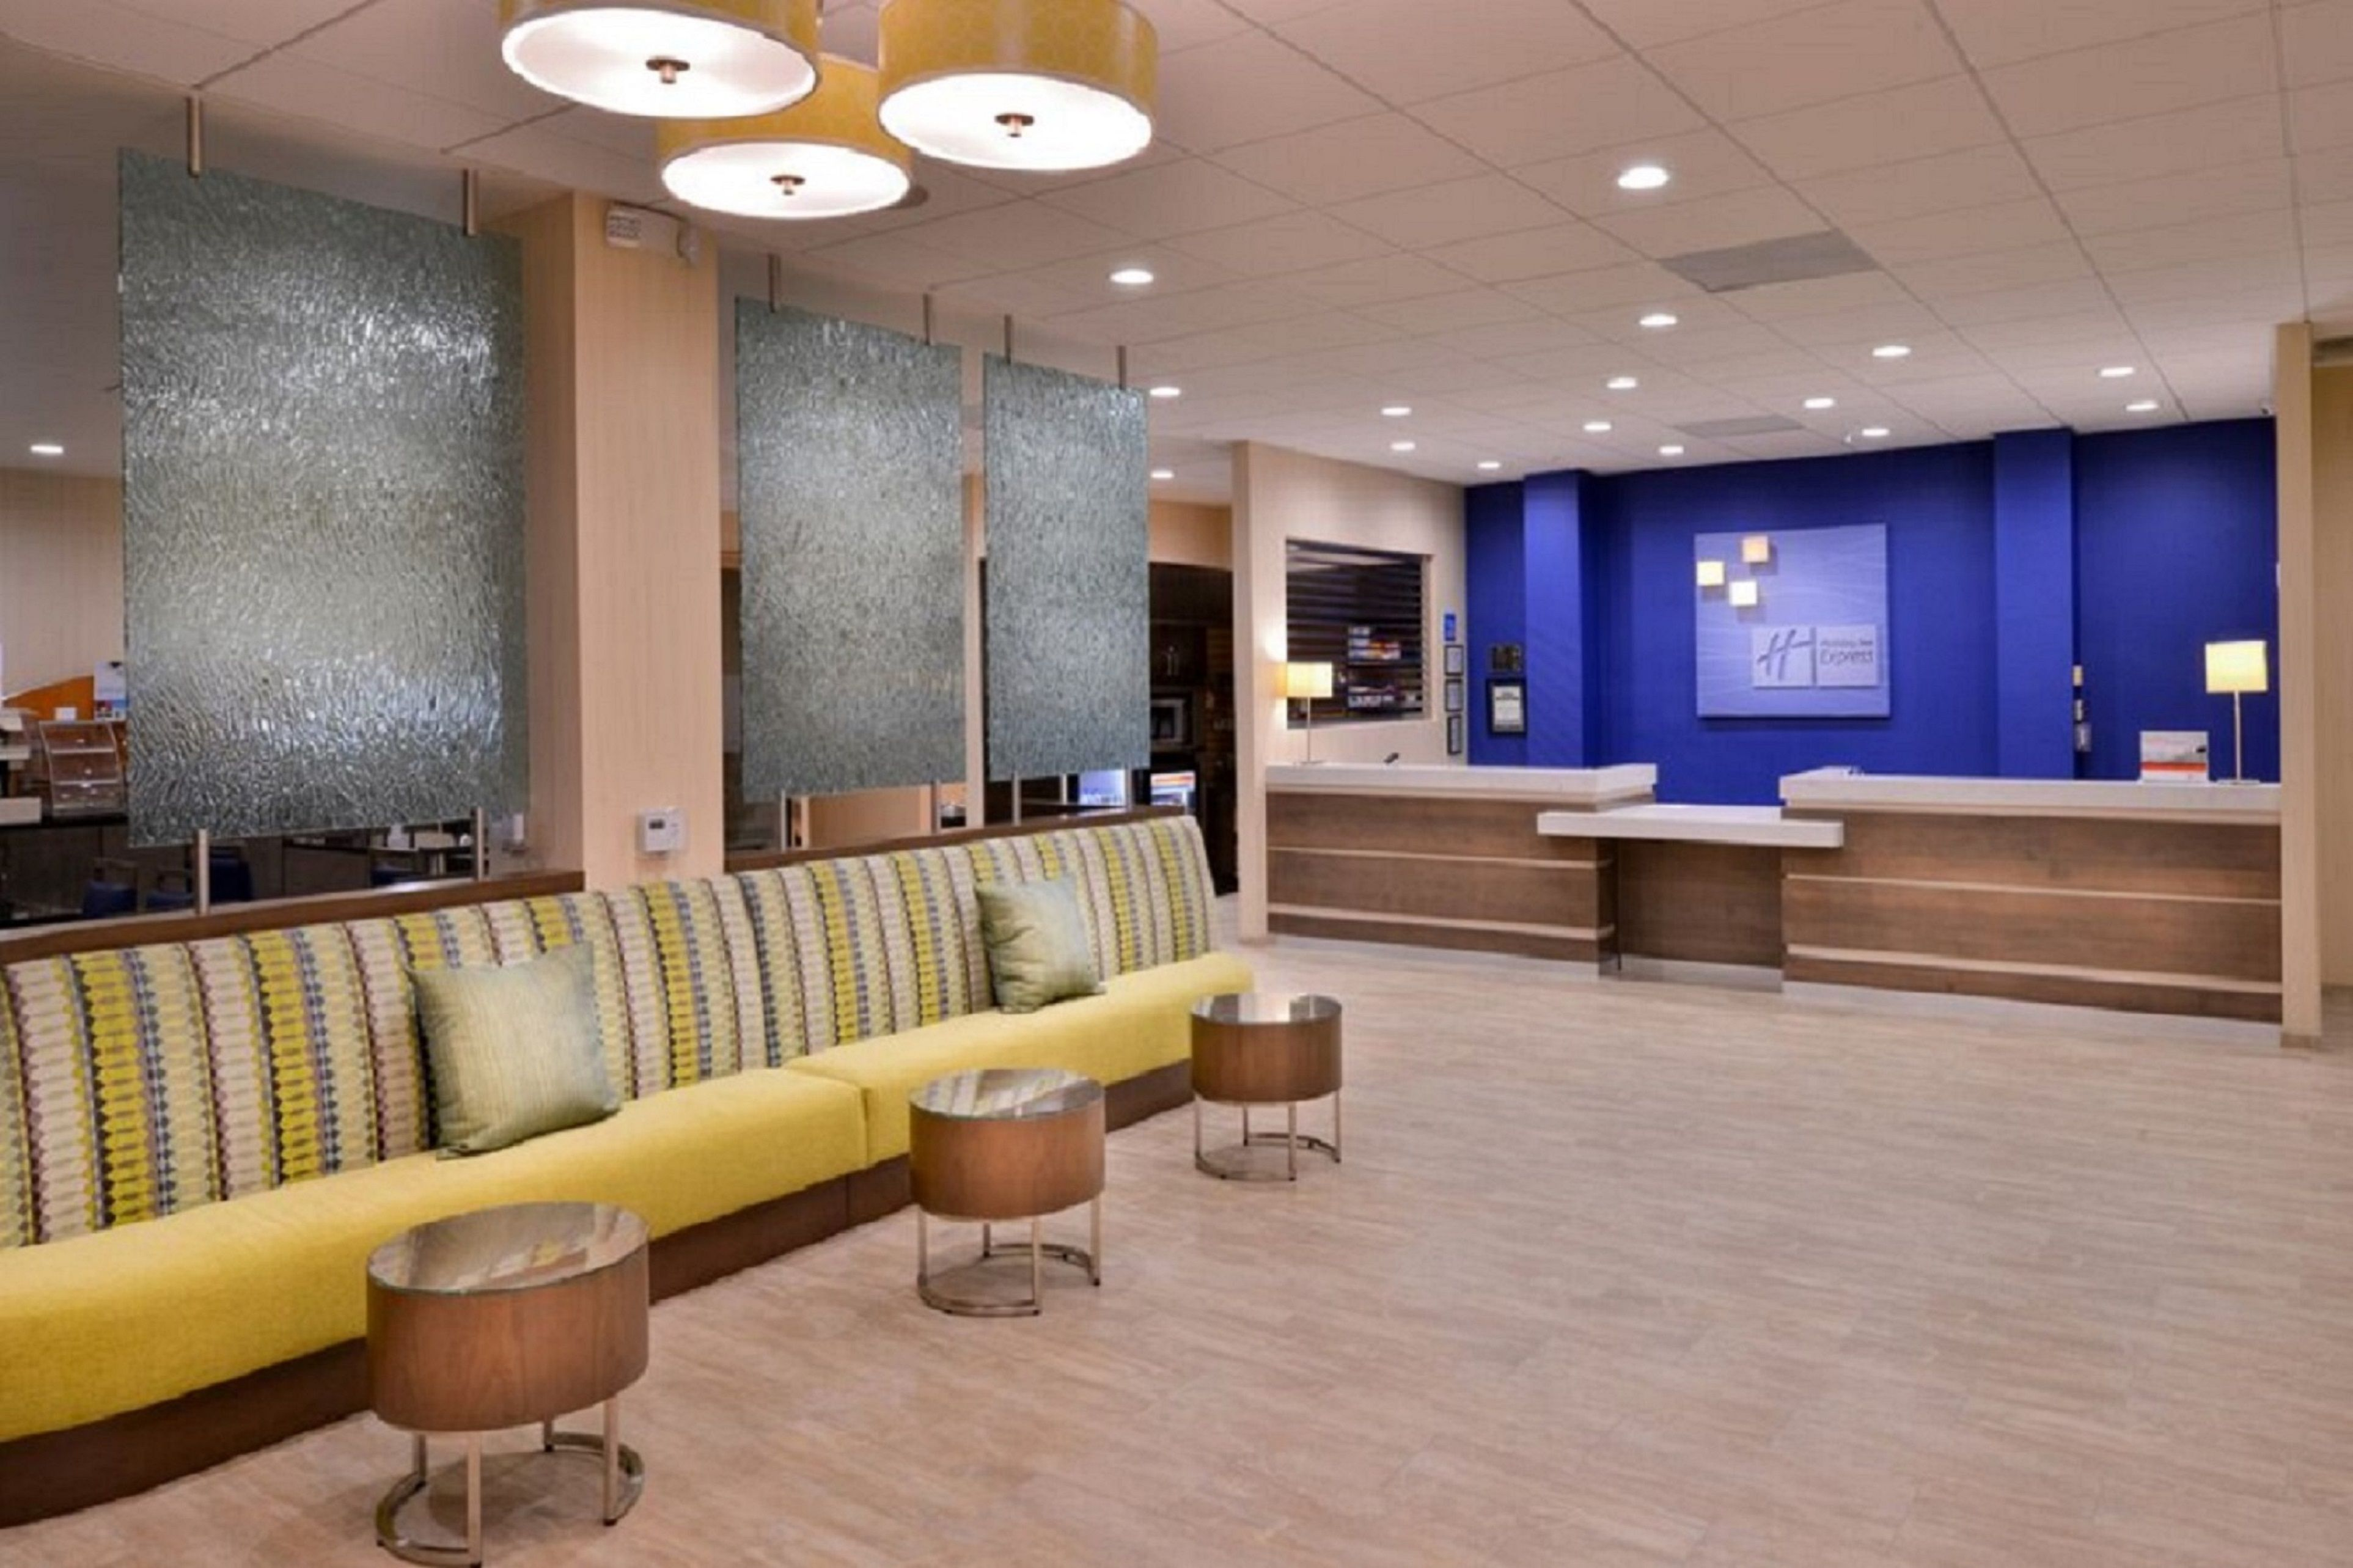 Holiday Inn Express Pasadena-Colorado Blvd. image 4